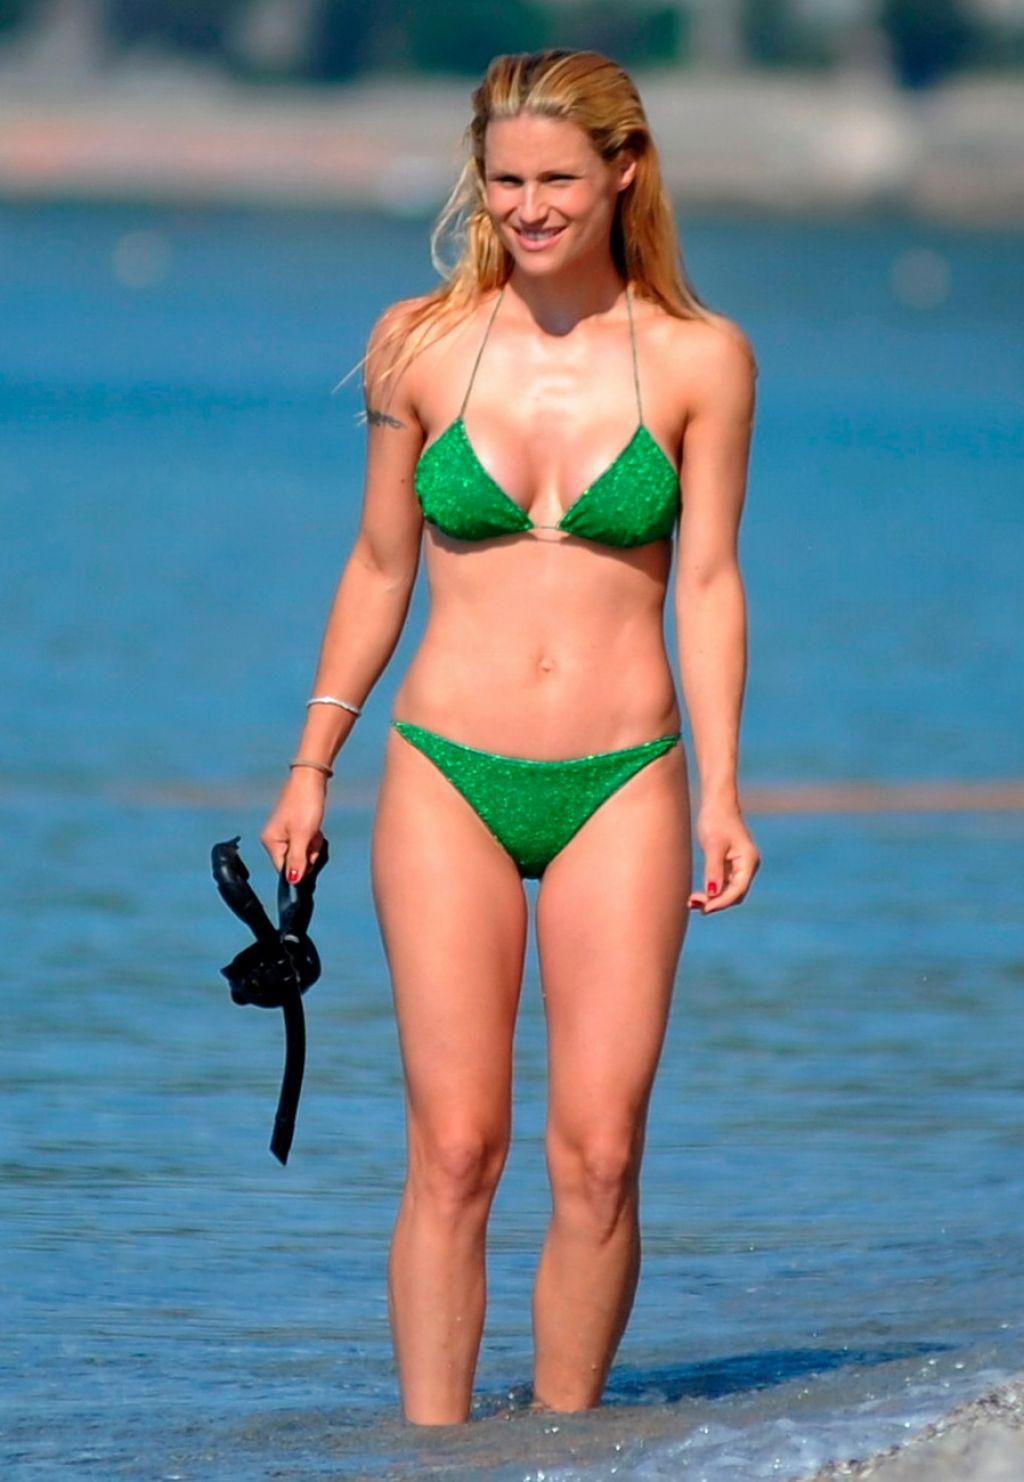 Ruth dales overall bikini class winner